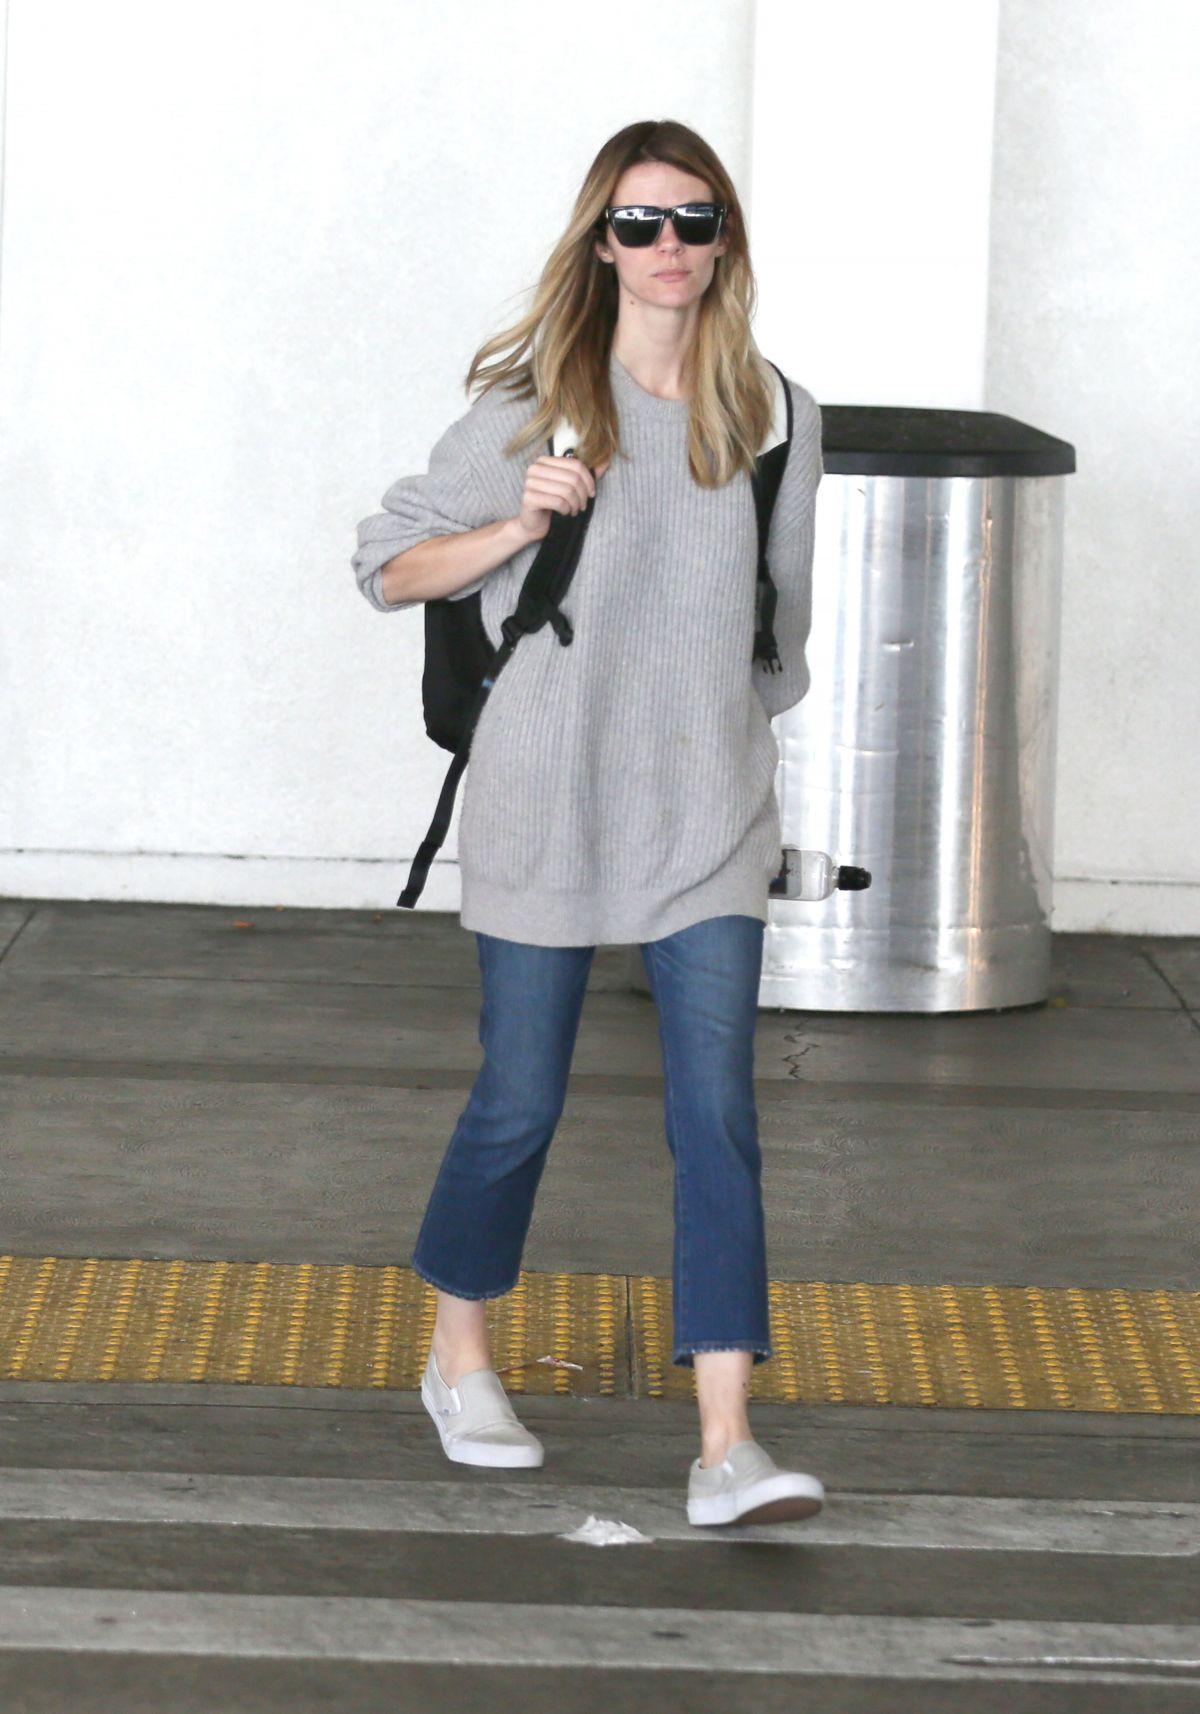 BROOKLYN DECKER at Los Angeles International Airport 05/02/2017